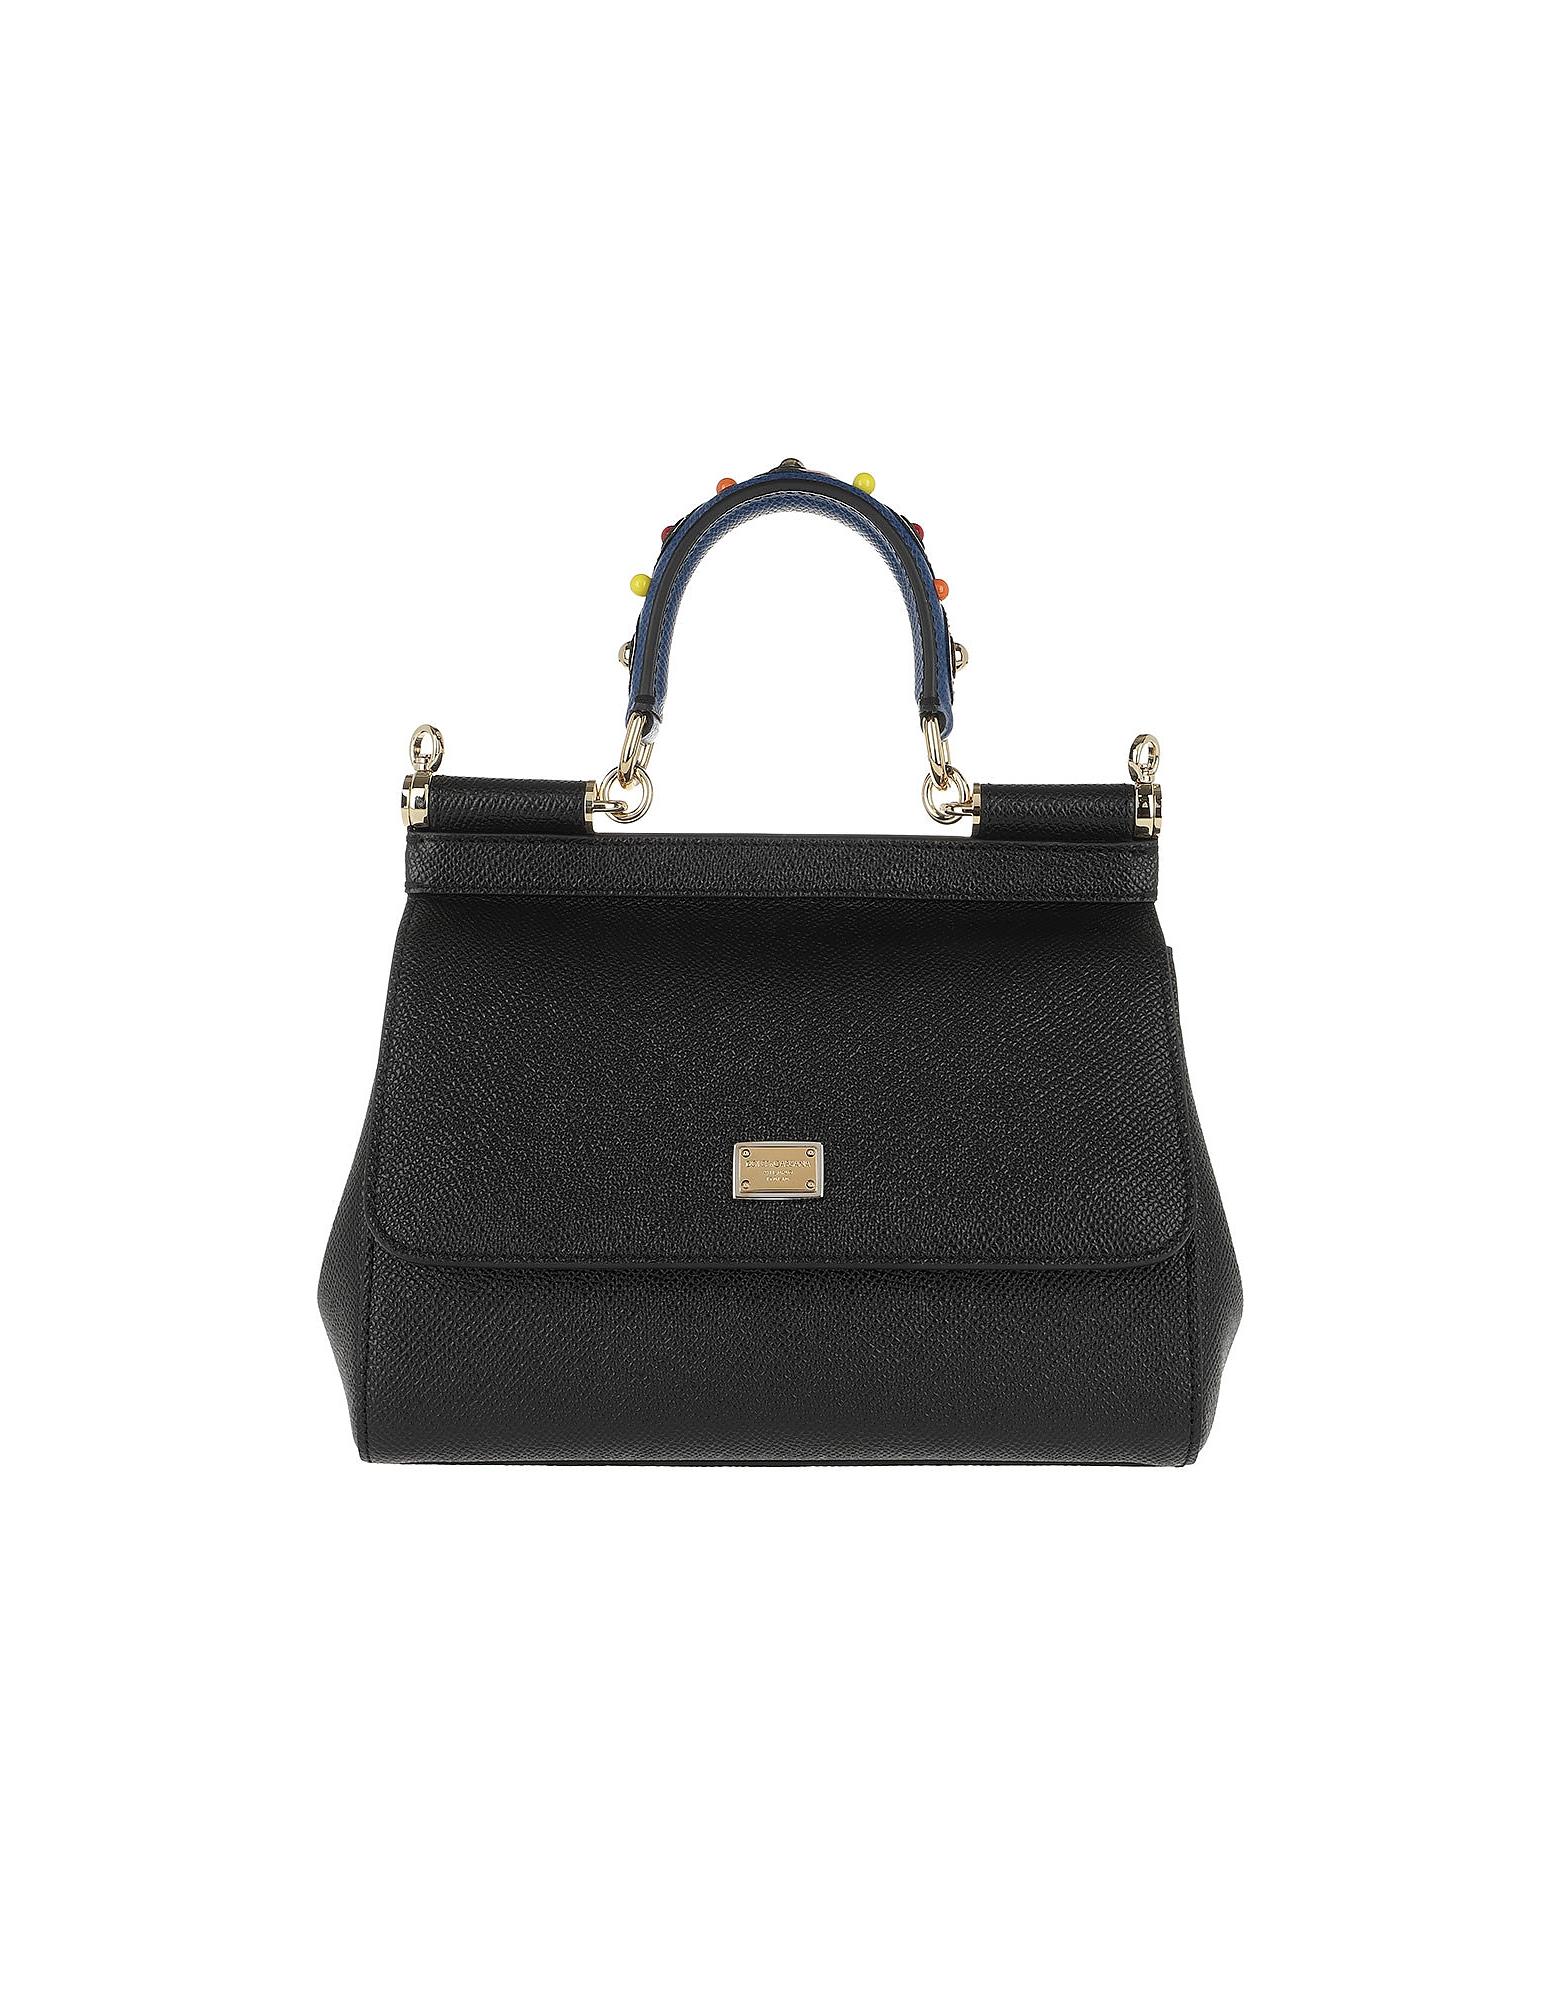 Dolce & Gabbana Handbags, Sicily Mini St. Dauphine Black